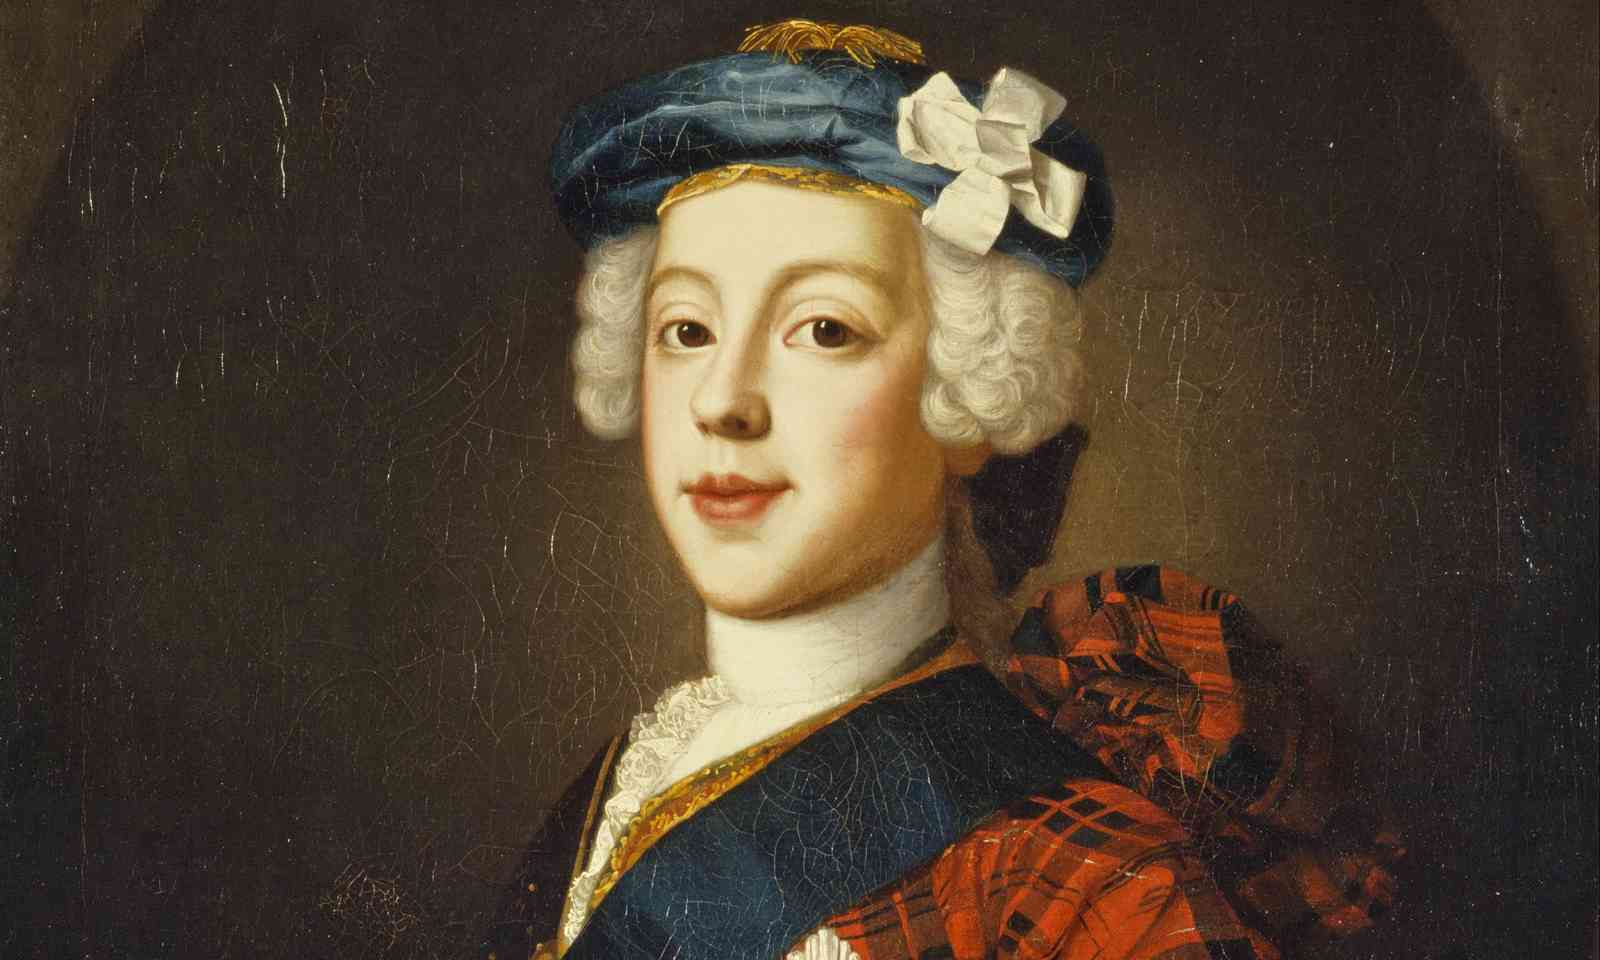 Bonnie Prince Charles by William Mosman, around 1700 (Public Domain)